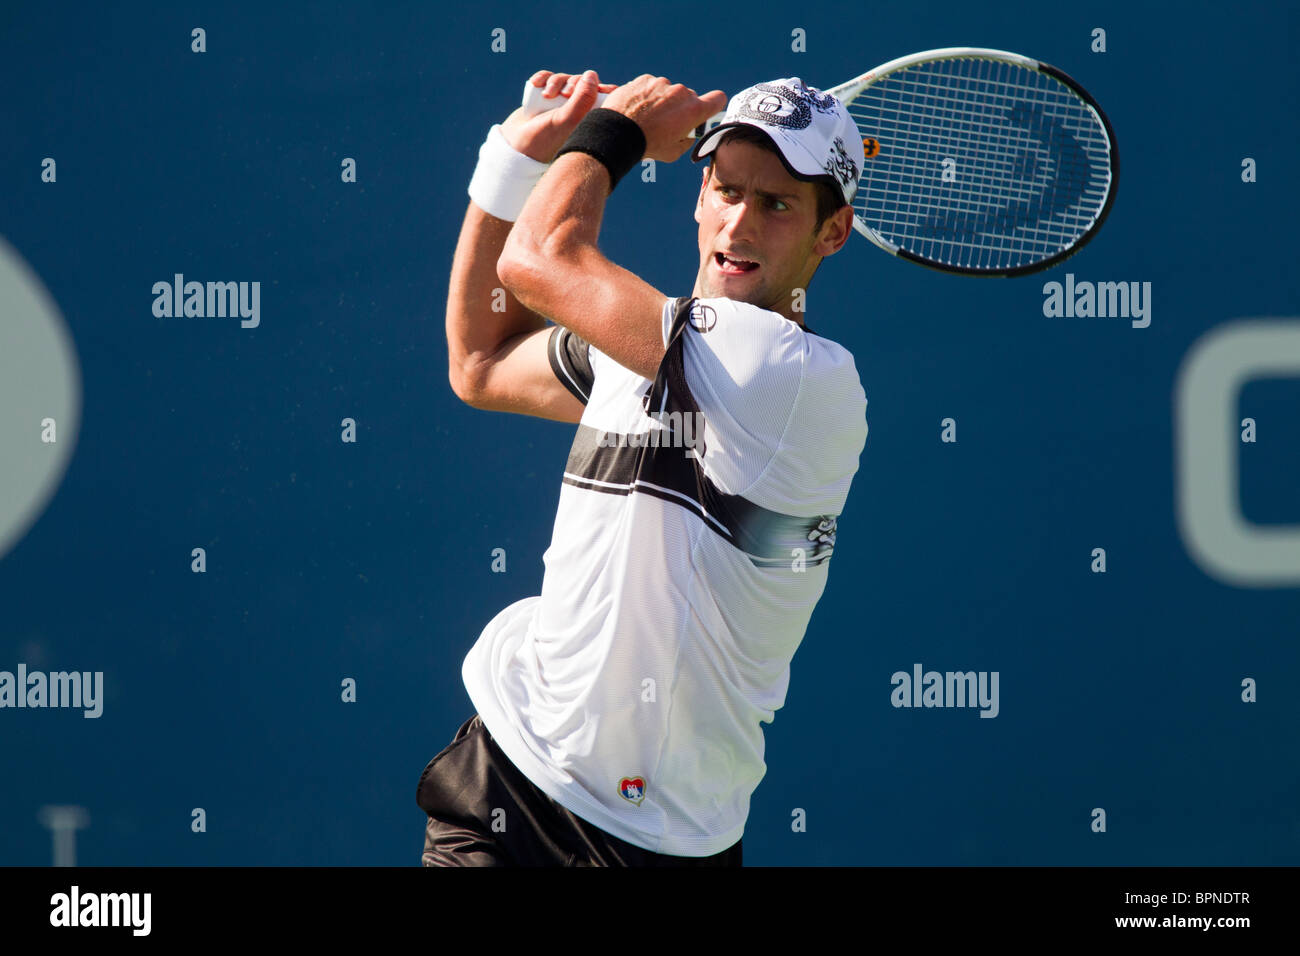 Novak Djokovic (SRB) 2010 US Open Tennis - Stock Image